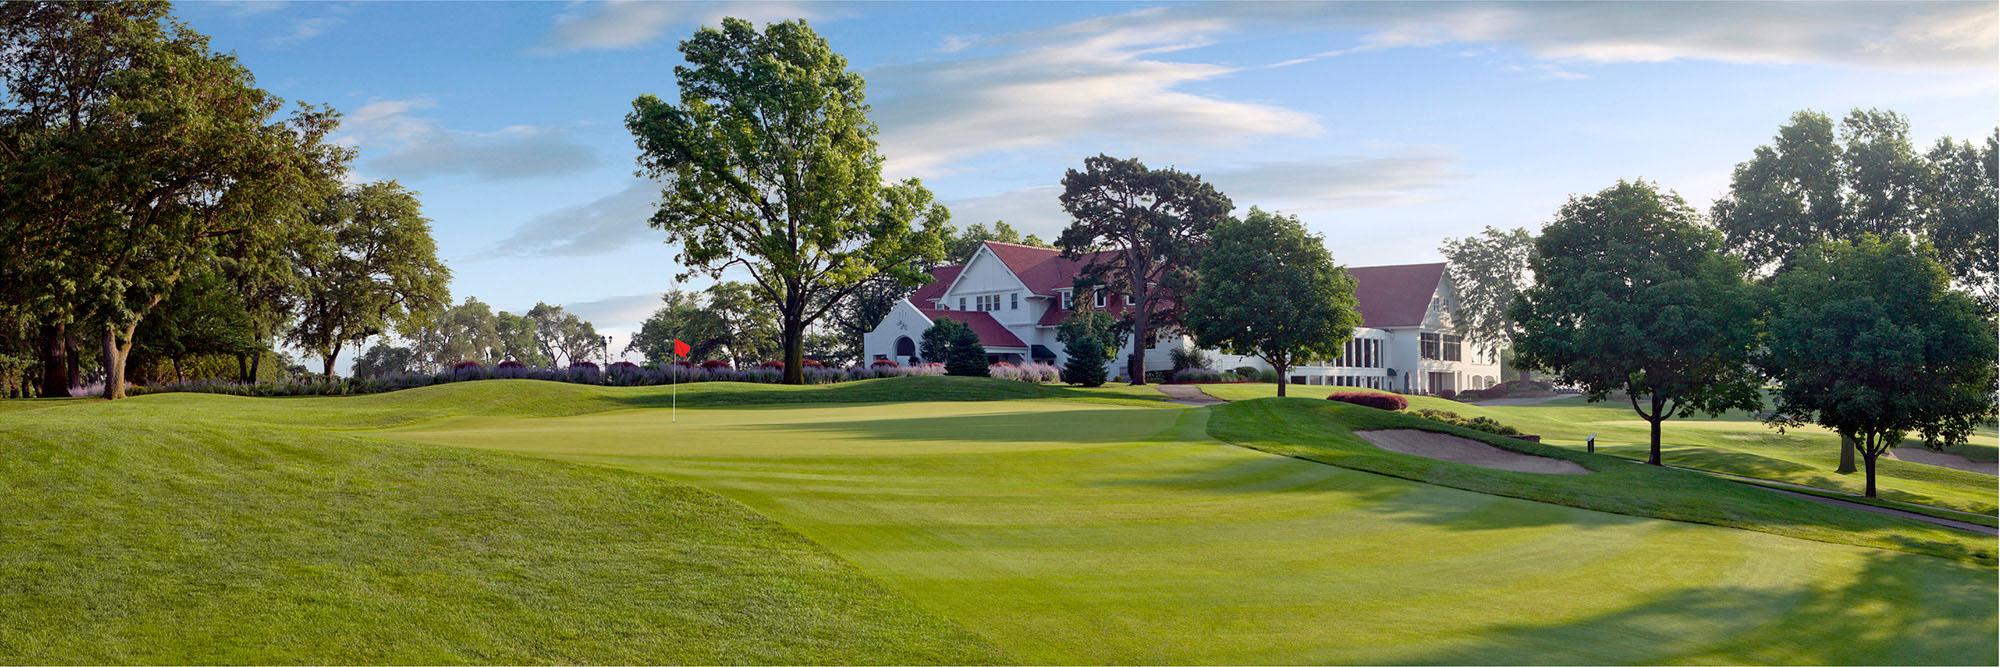 Golf Course Image - Happy Hollow Golf Club No. 7